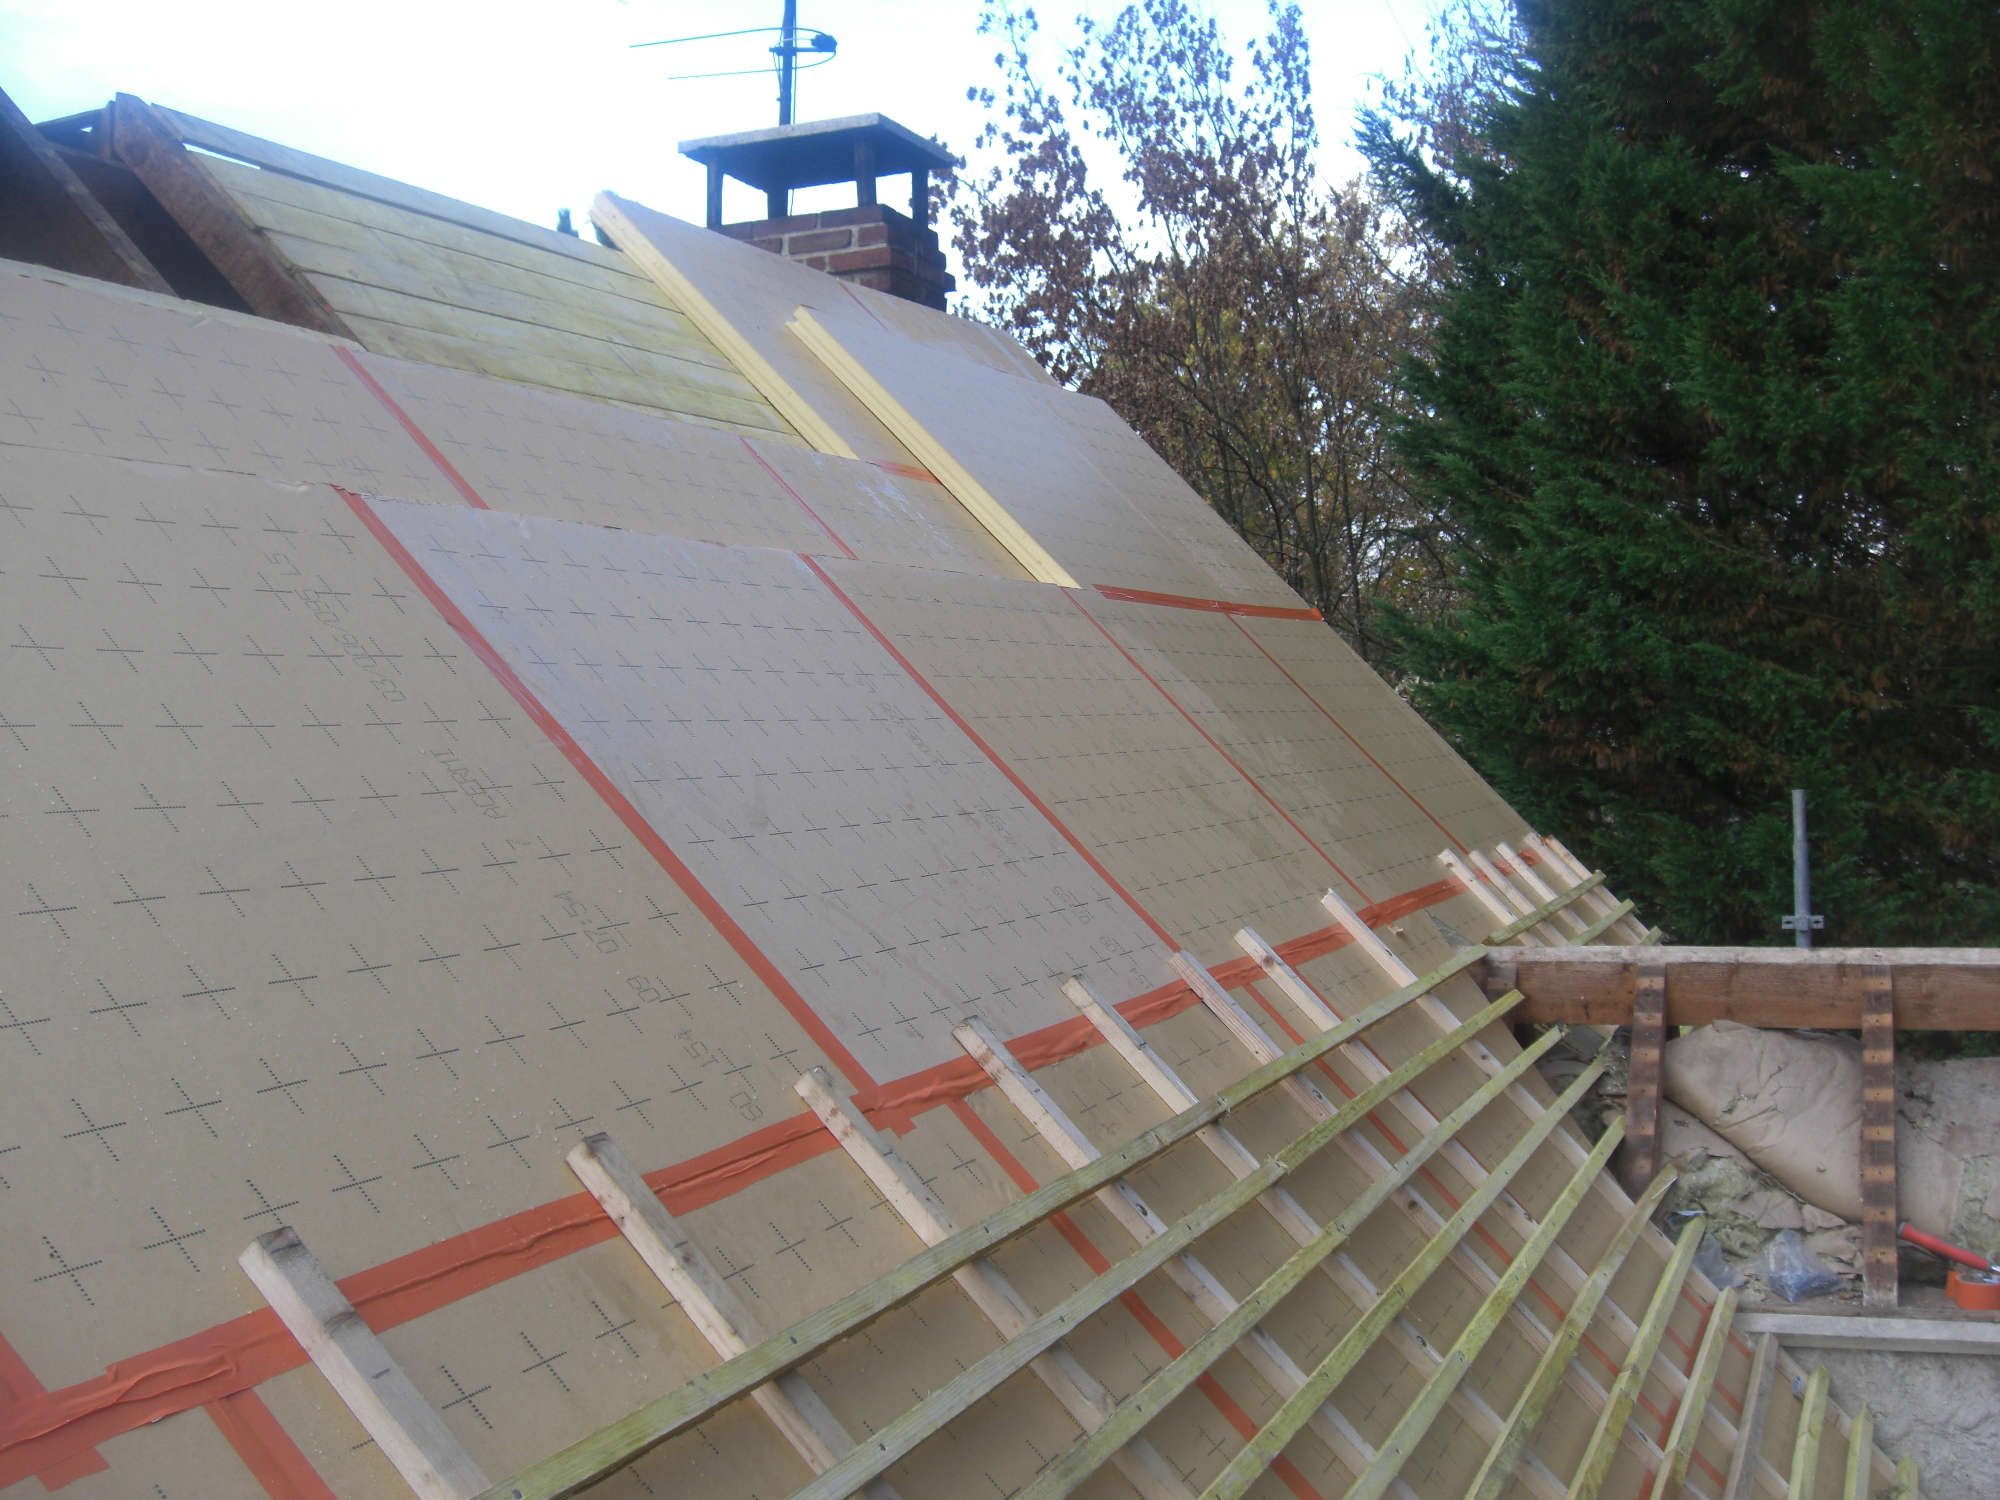 isoler une toiture top isoler toiture plate with isoler. Black Bedroom Furniture Sets. Home Design Ideas